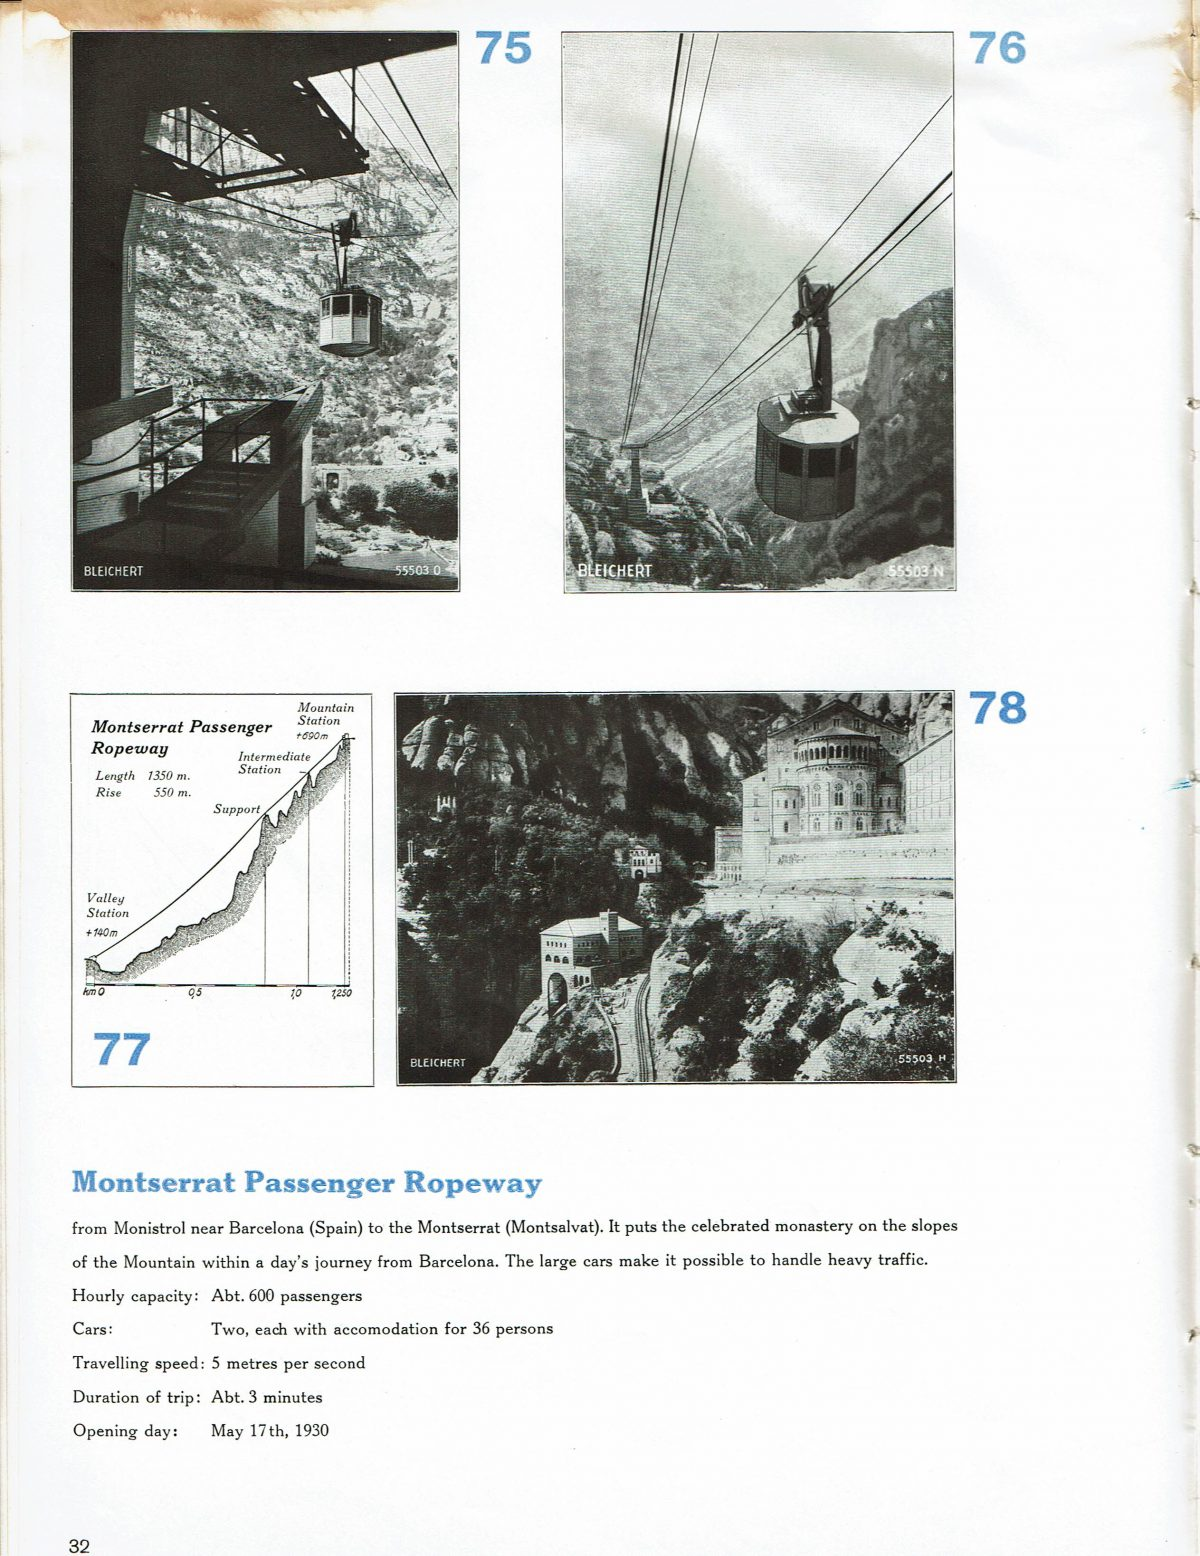 1933 Bleichert Passenger Arial Ropeways 29